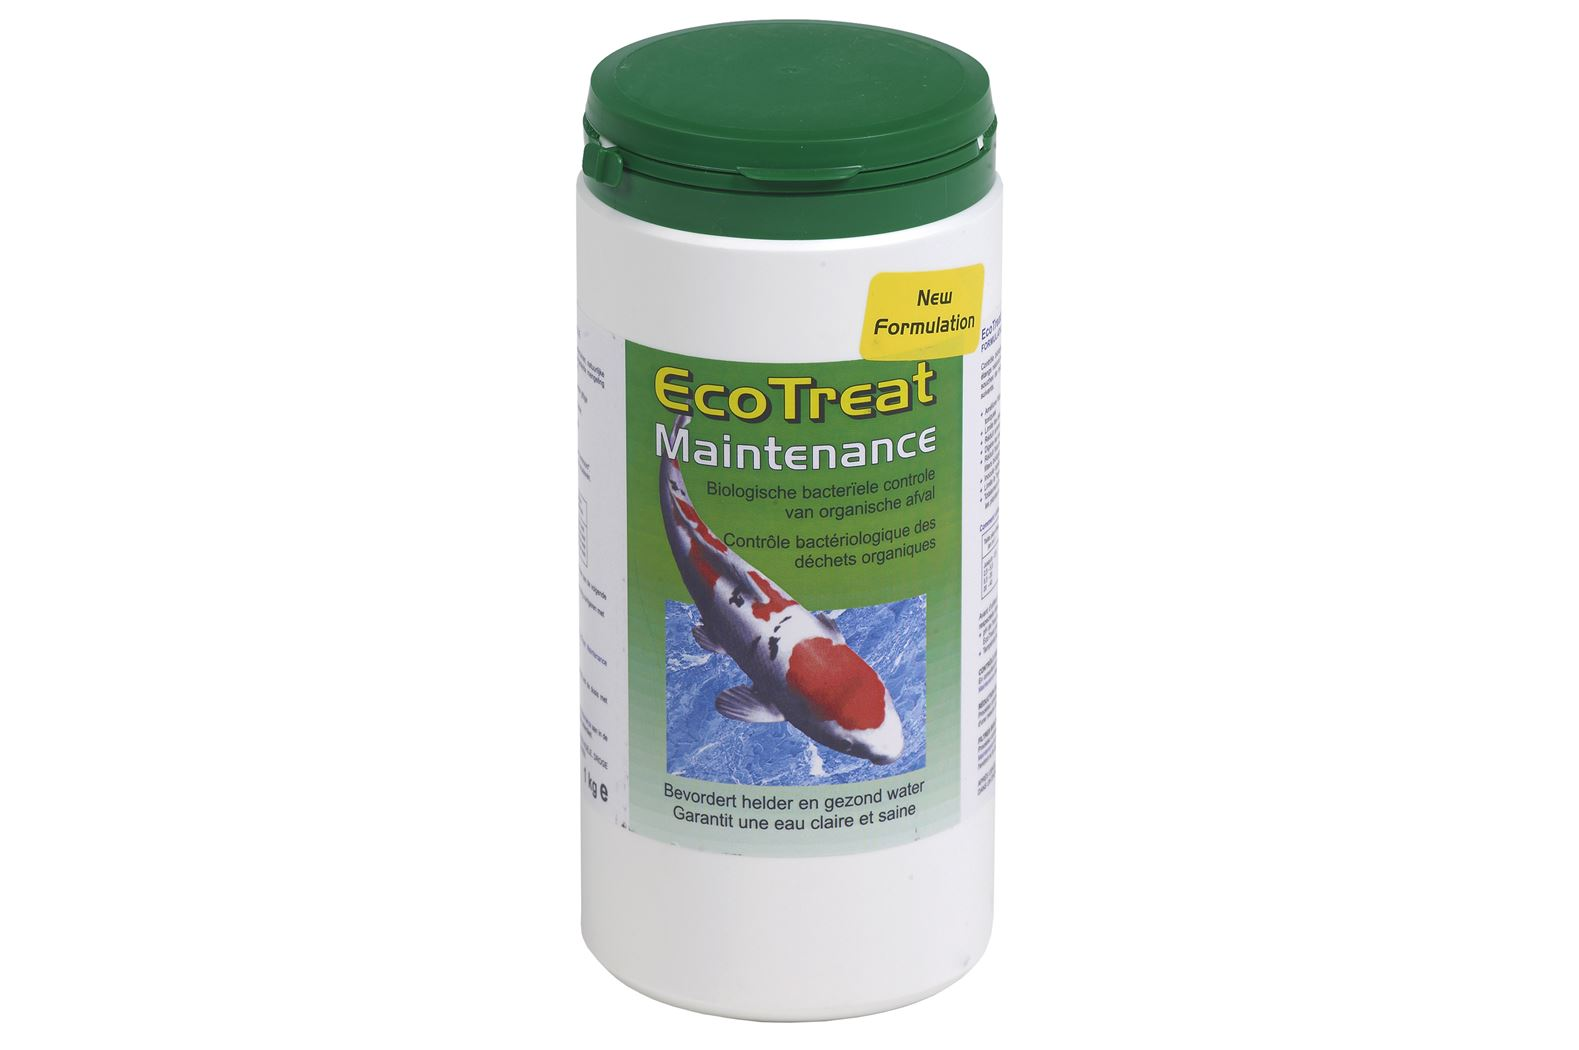 ecotreat maintenance